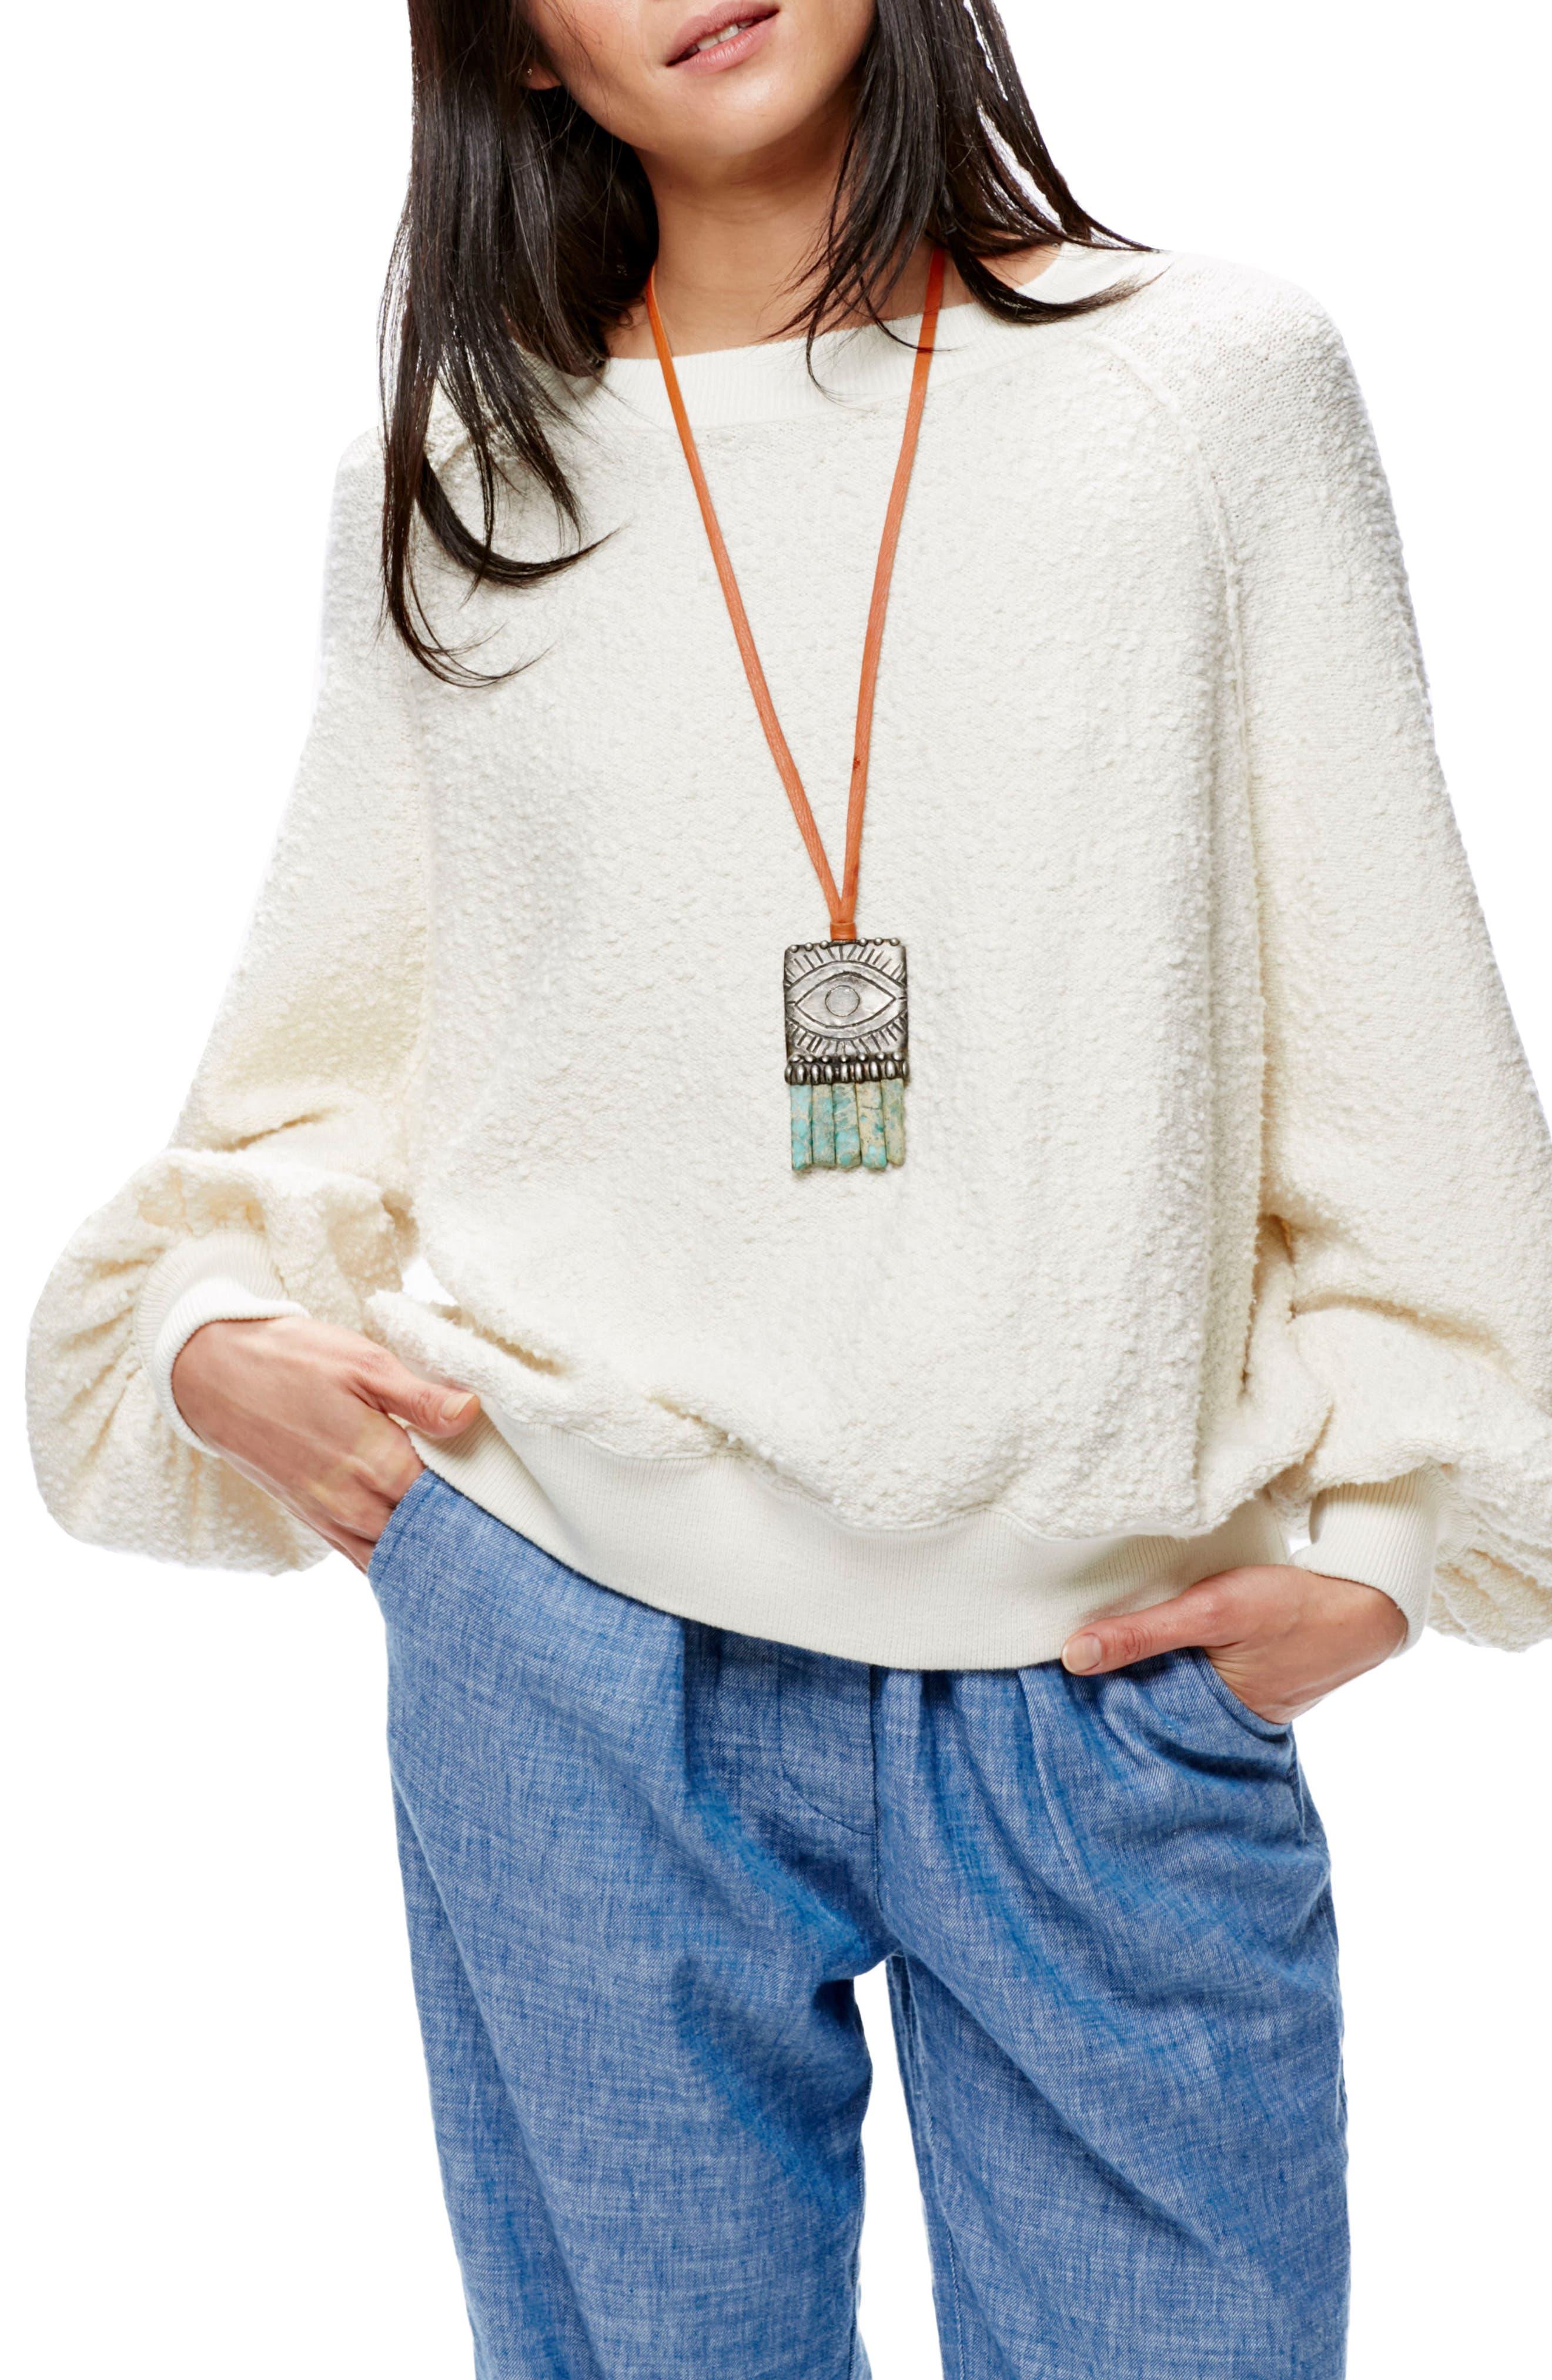 Found My Friend Sweatshirt,                         Main,                         color, IVORY